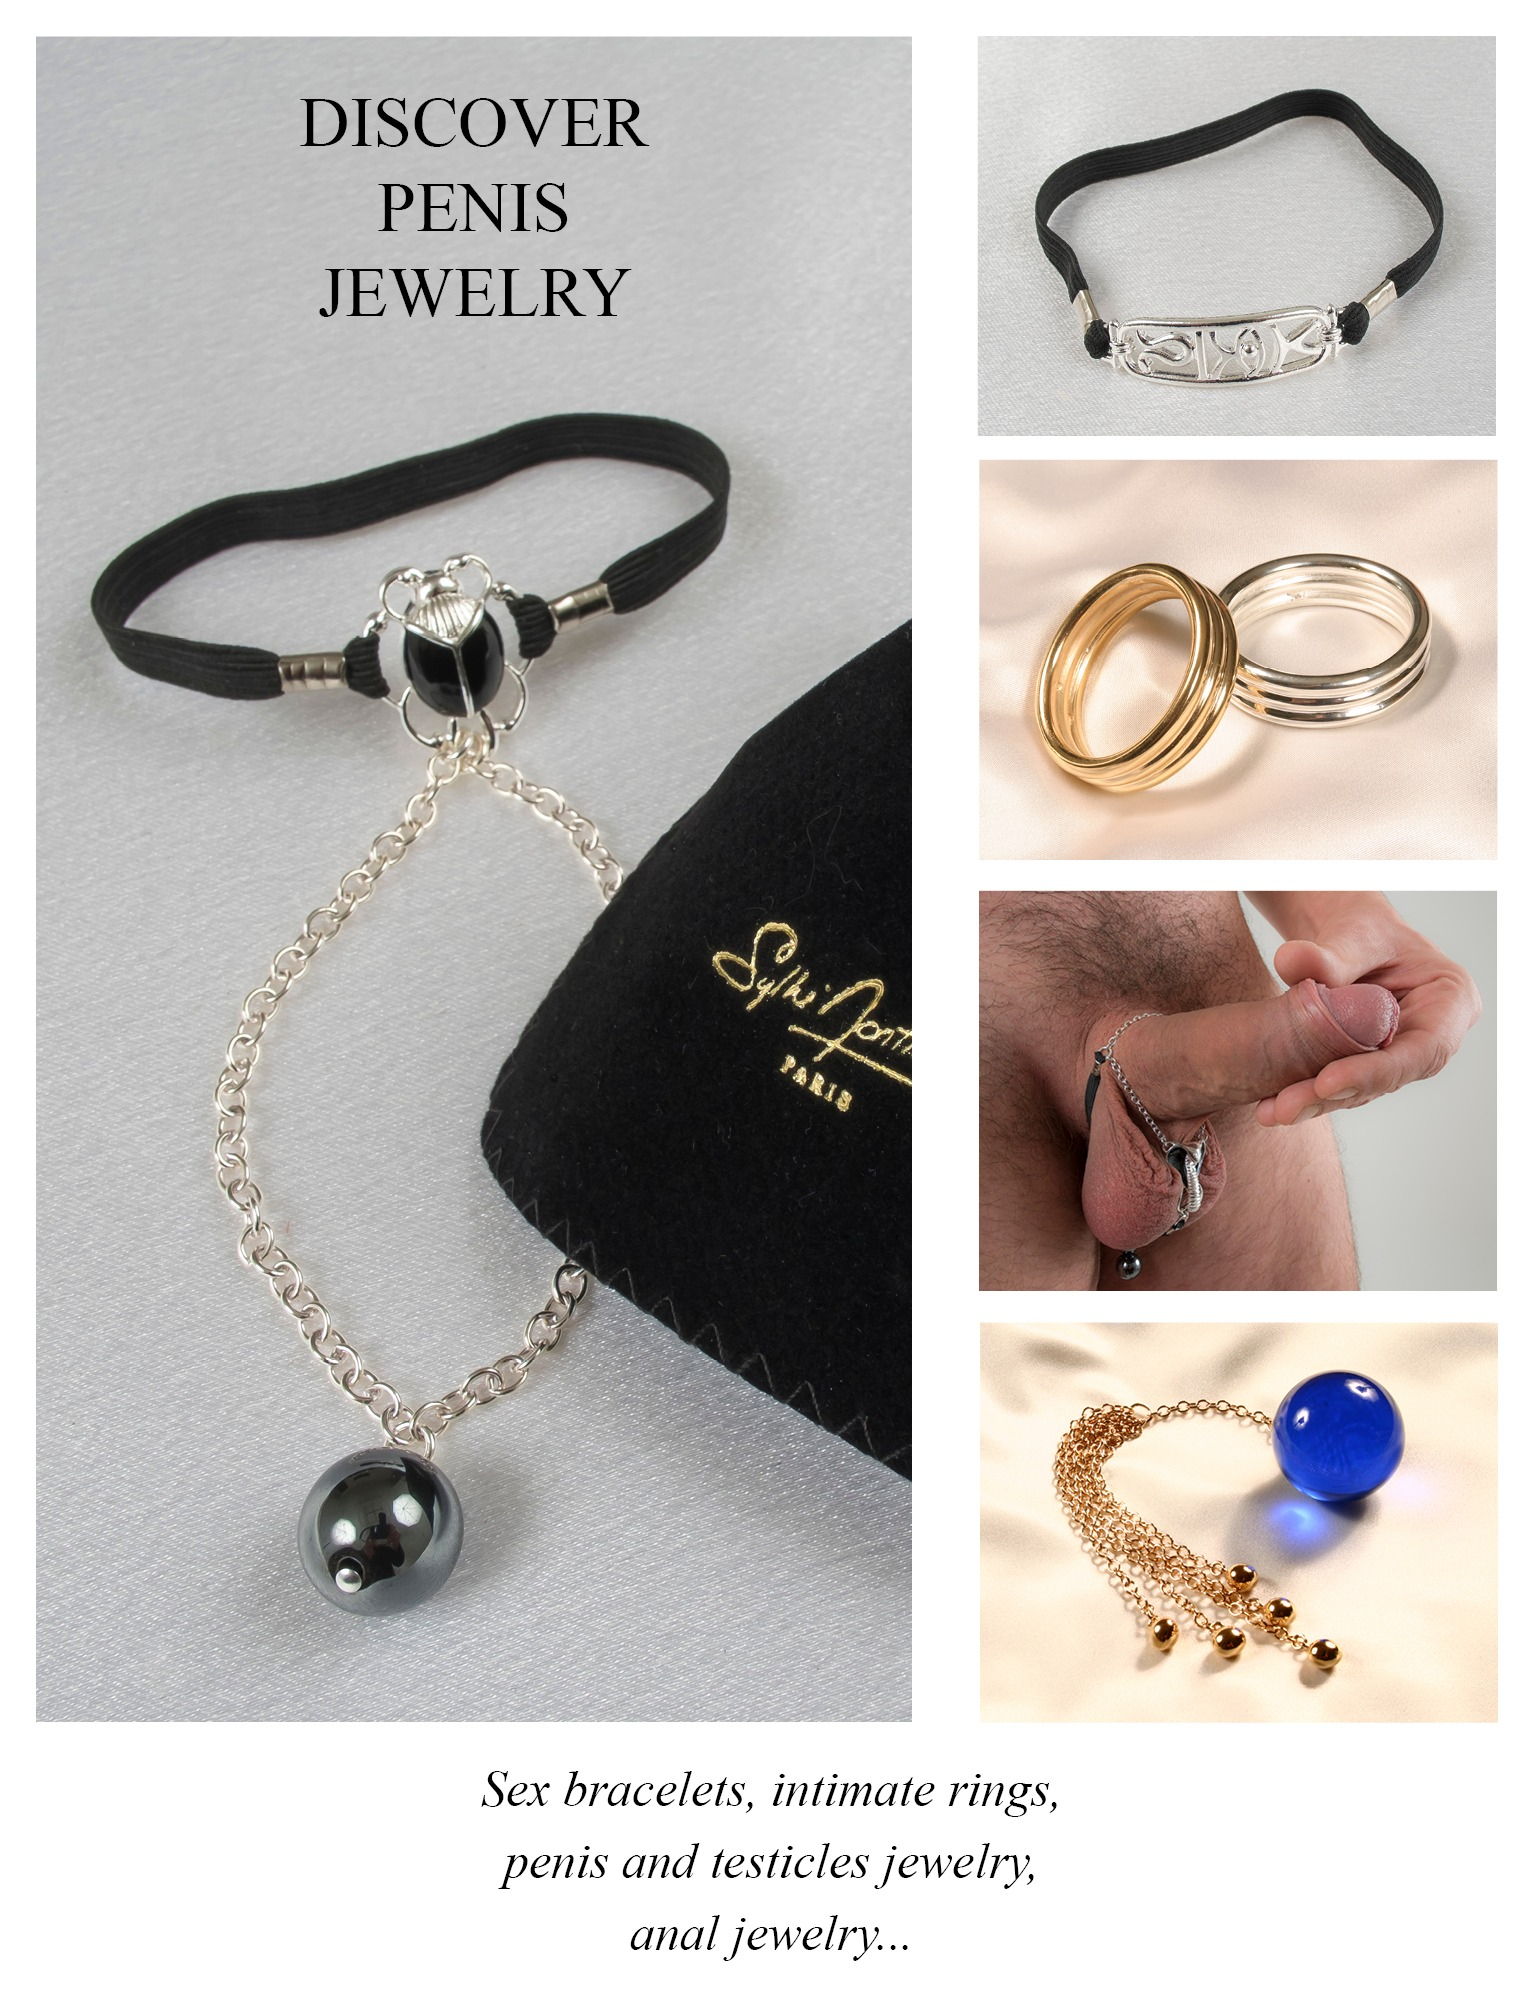 penis-jewelry-sexy-store